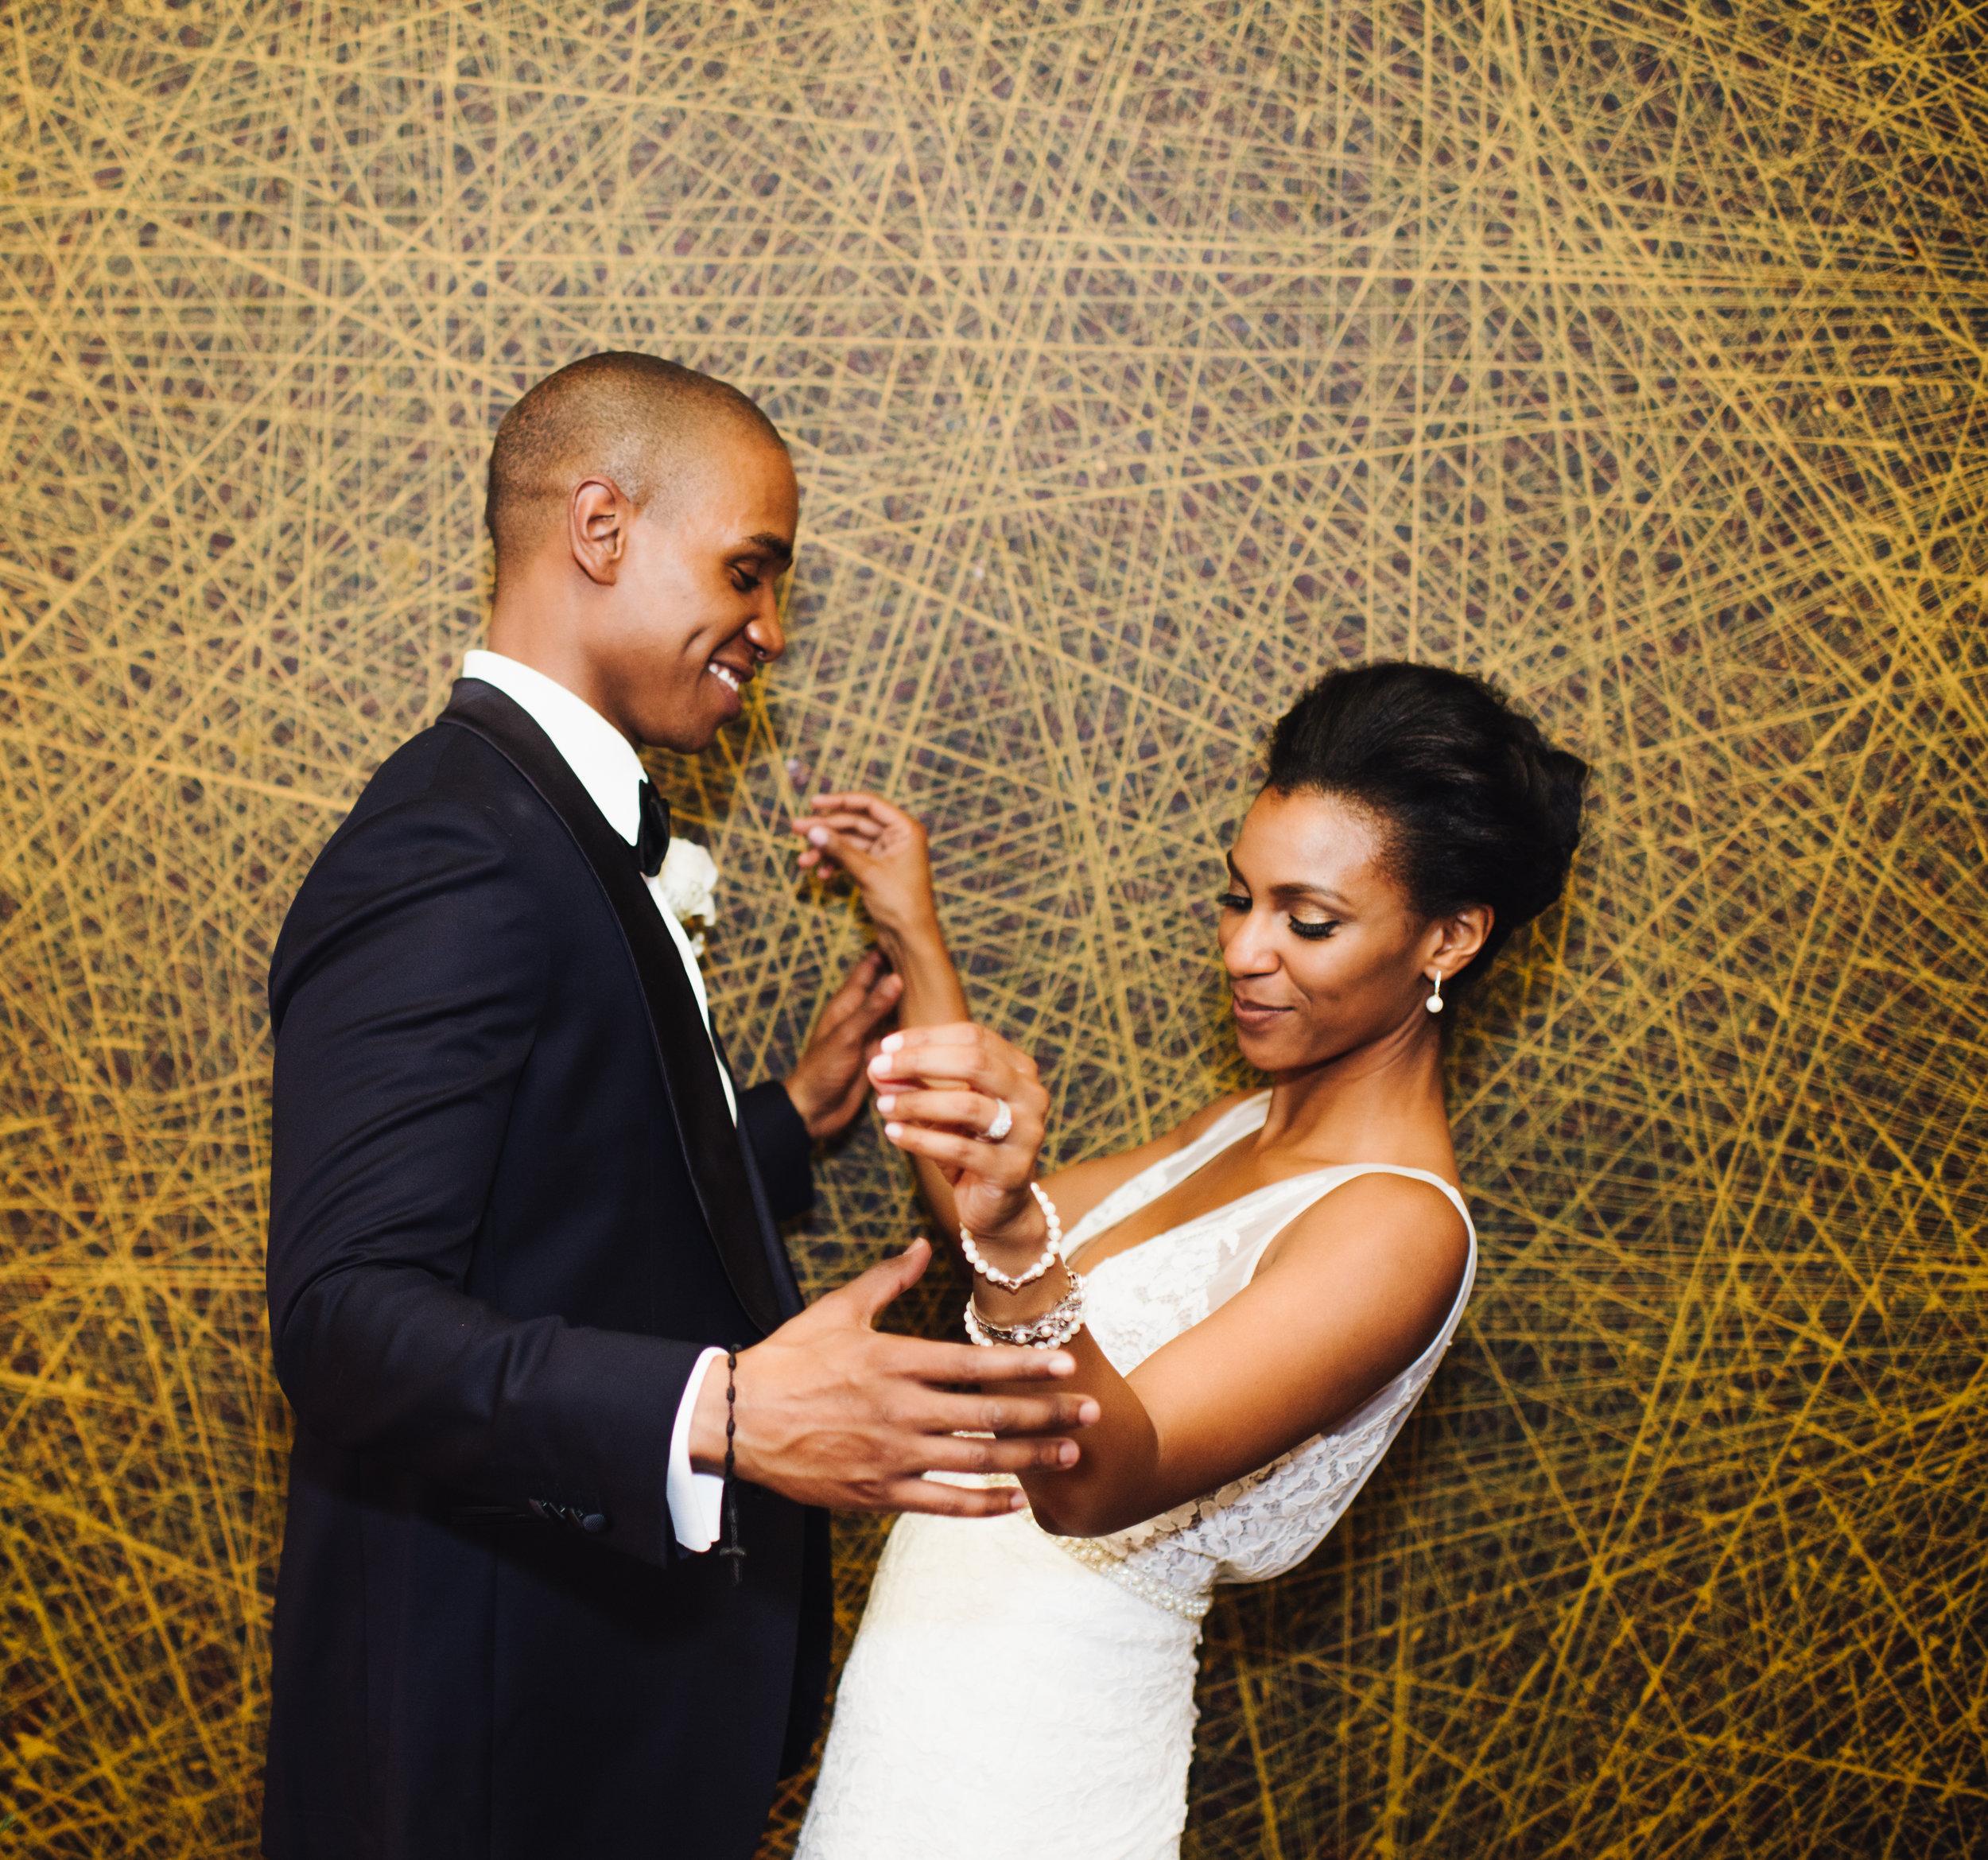 DANIELLE & BRANDON WEDDING - HEDGE ART GALLERY - NYC INTIMATE WEDDING PHOTOGRAPHER - CHI-CHI ARI-511.jpg